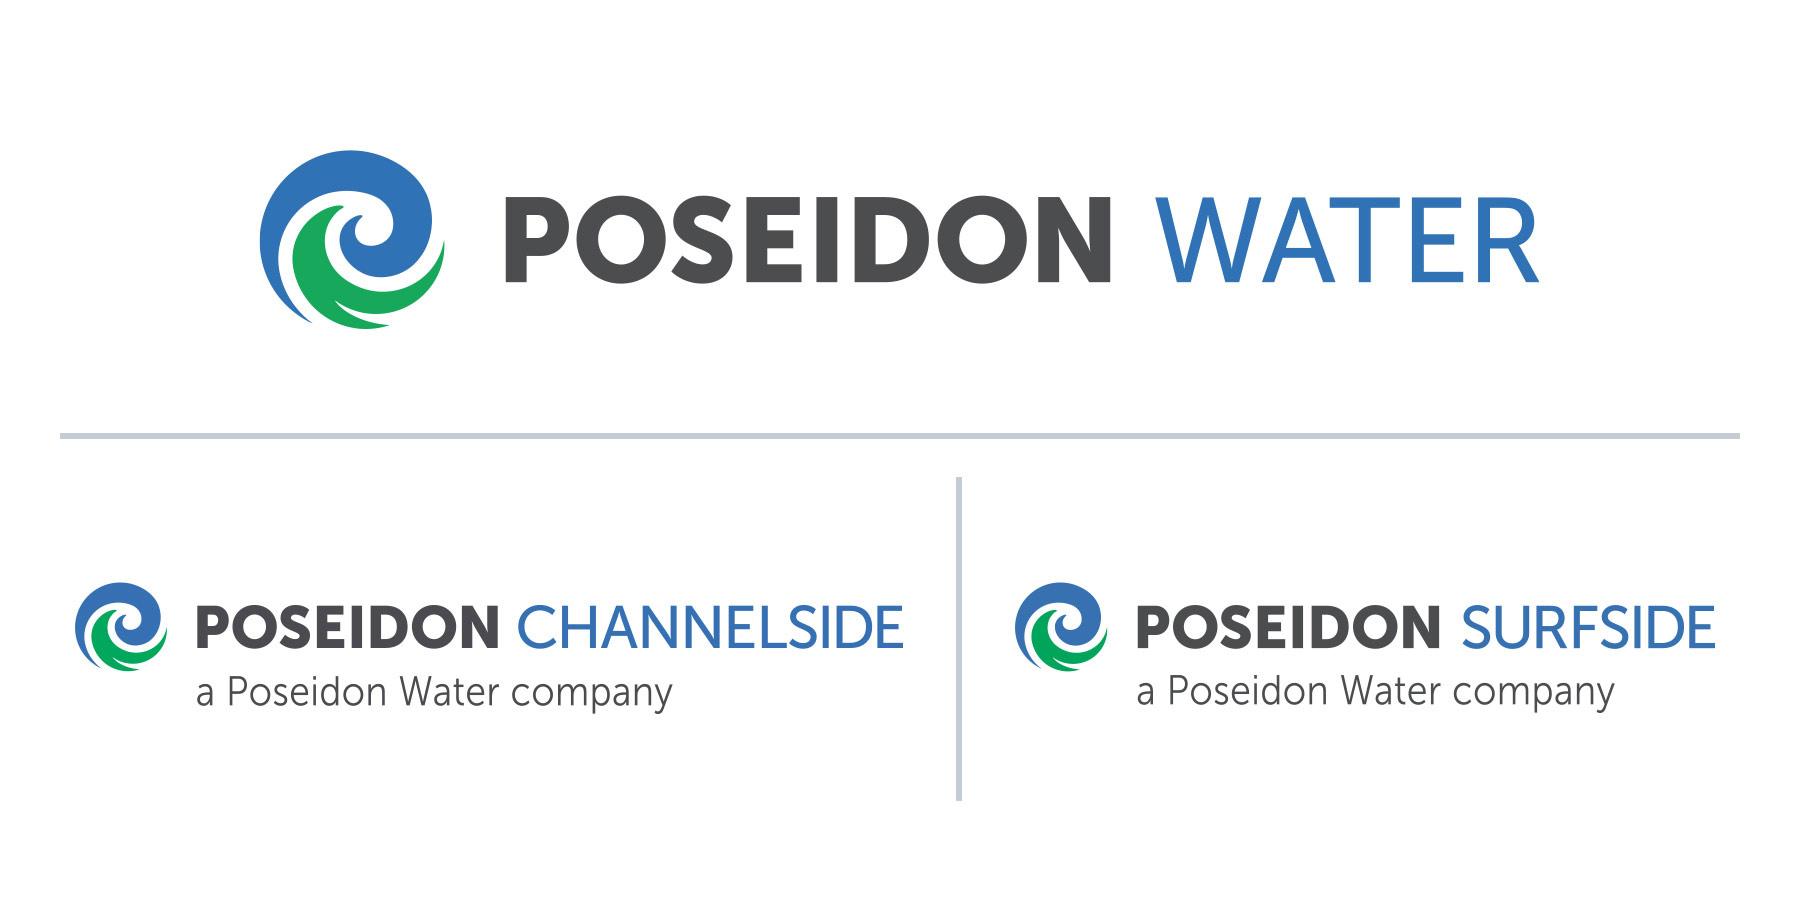 Poseidon logos